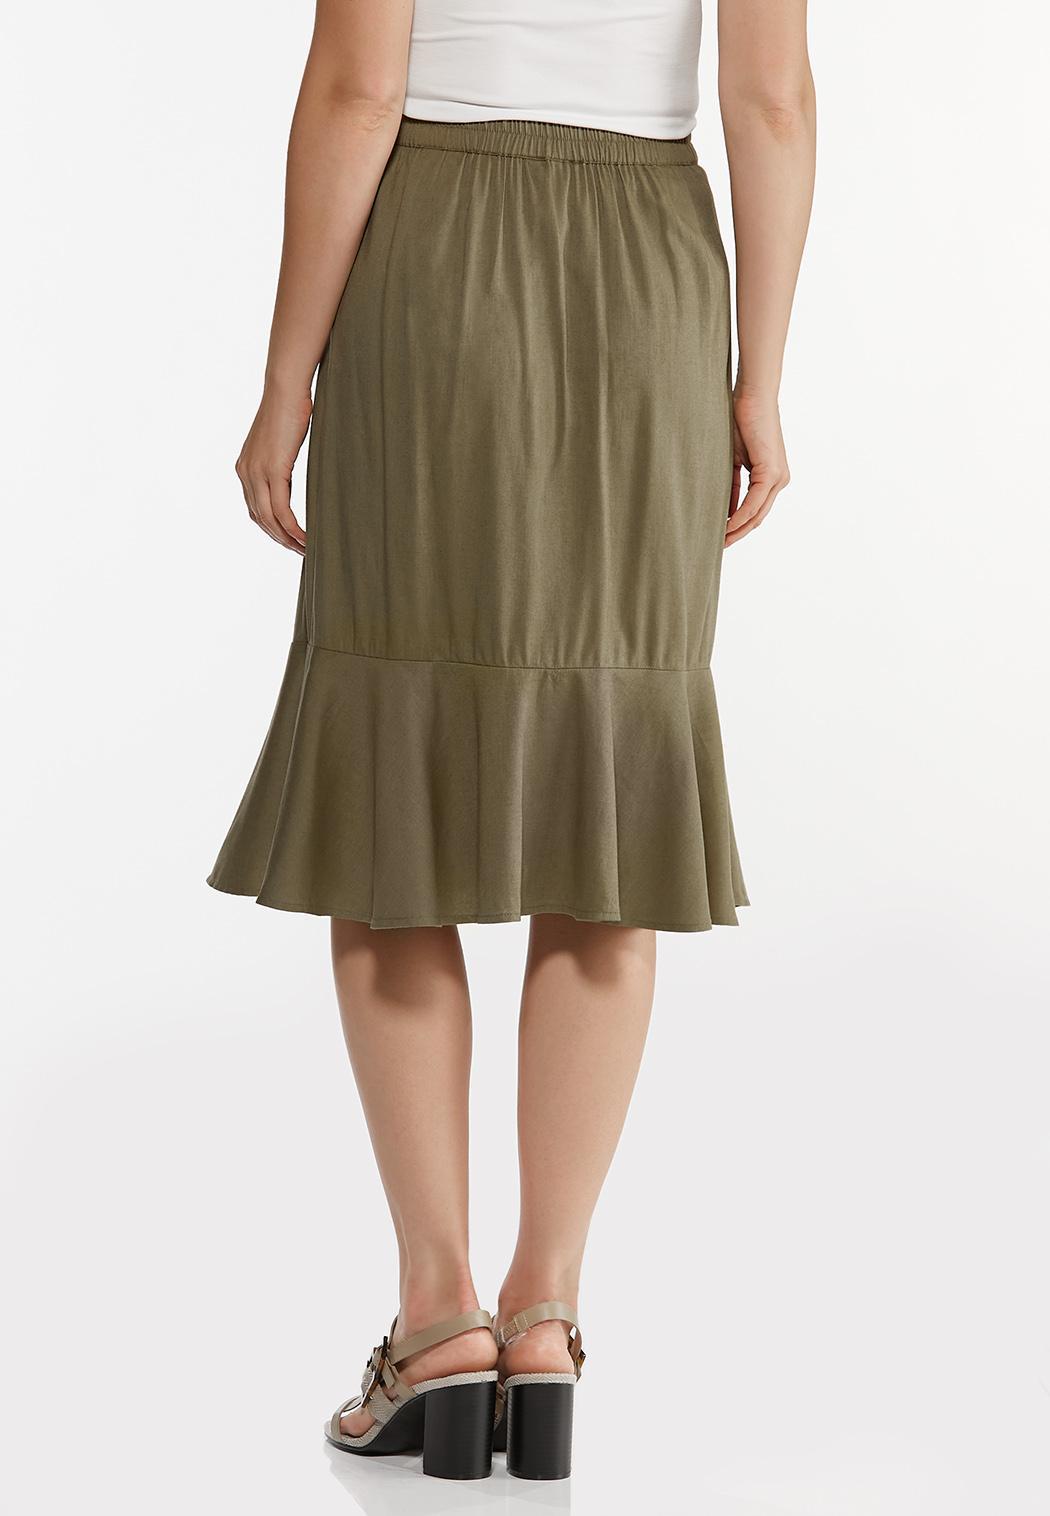 Plus Size Flounced Button Front Skirt (Item #44467377)